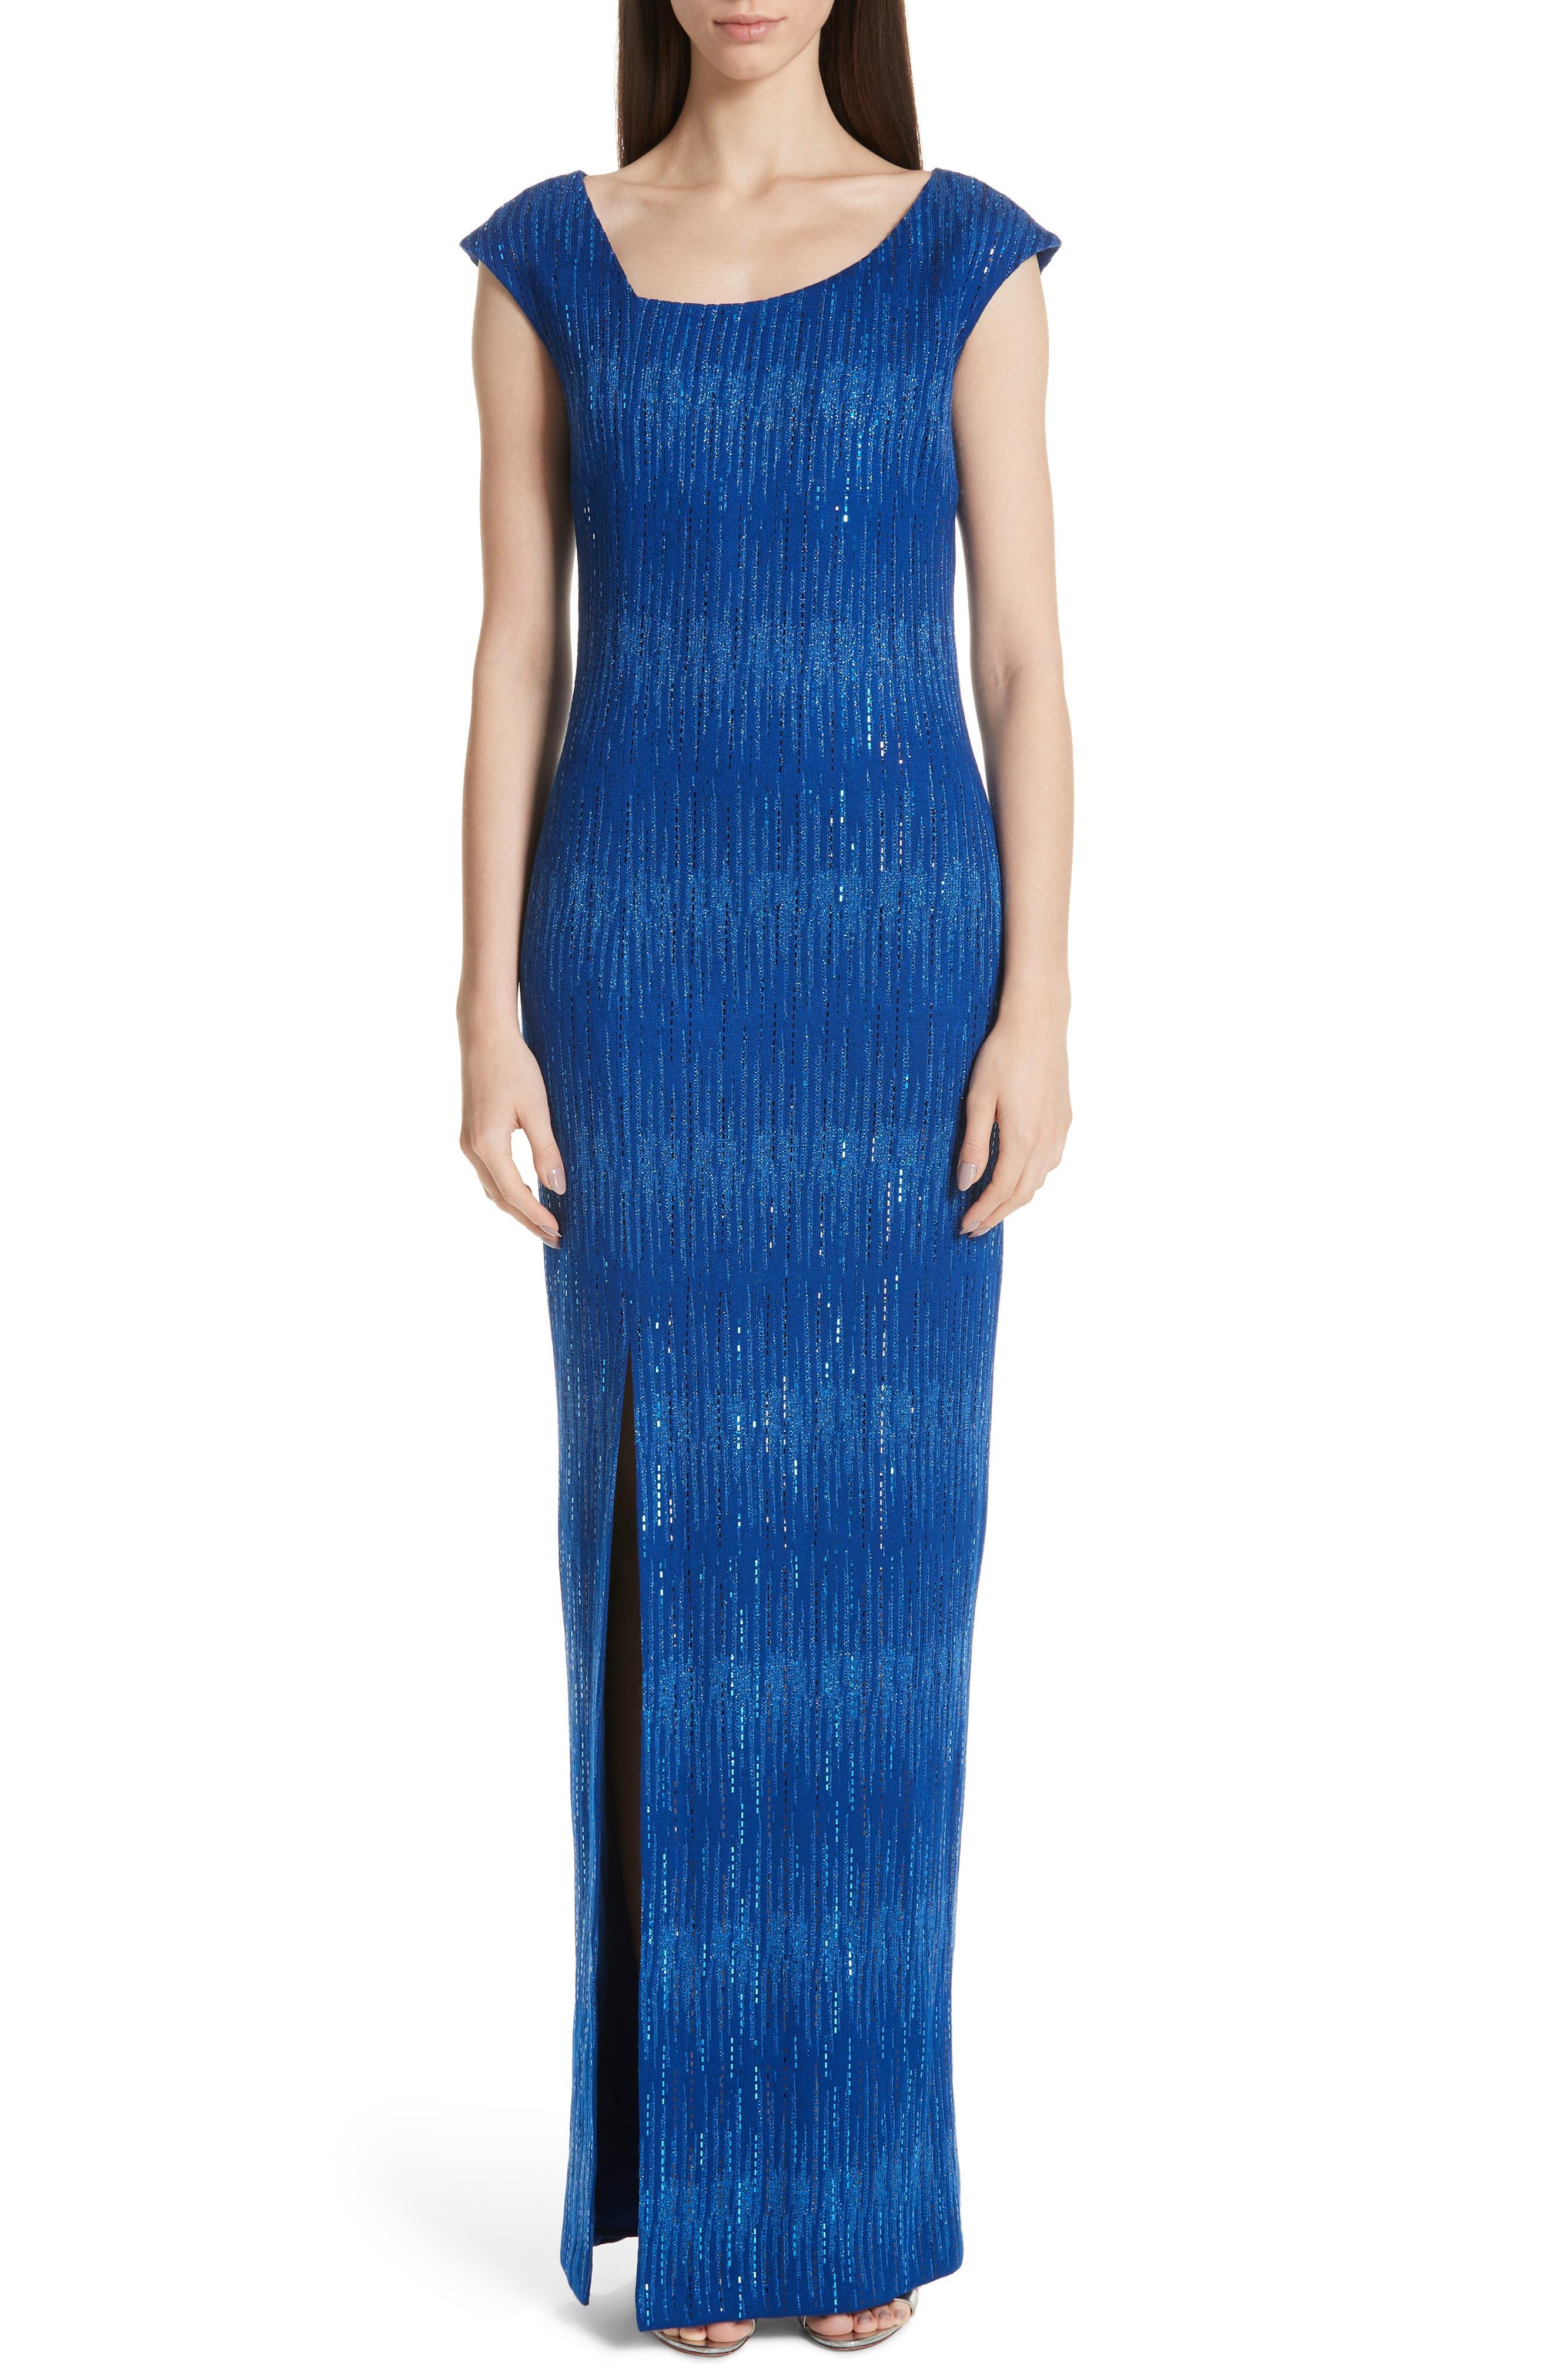 ST. JOHN COLLECTION Asymmetrical Neck Carrie Knit Evening Dress, Main, color, AZUL